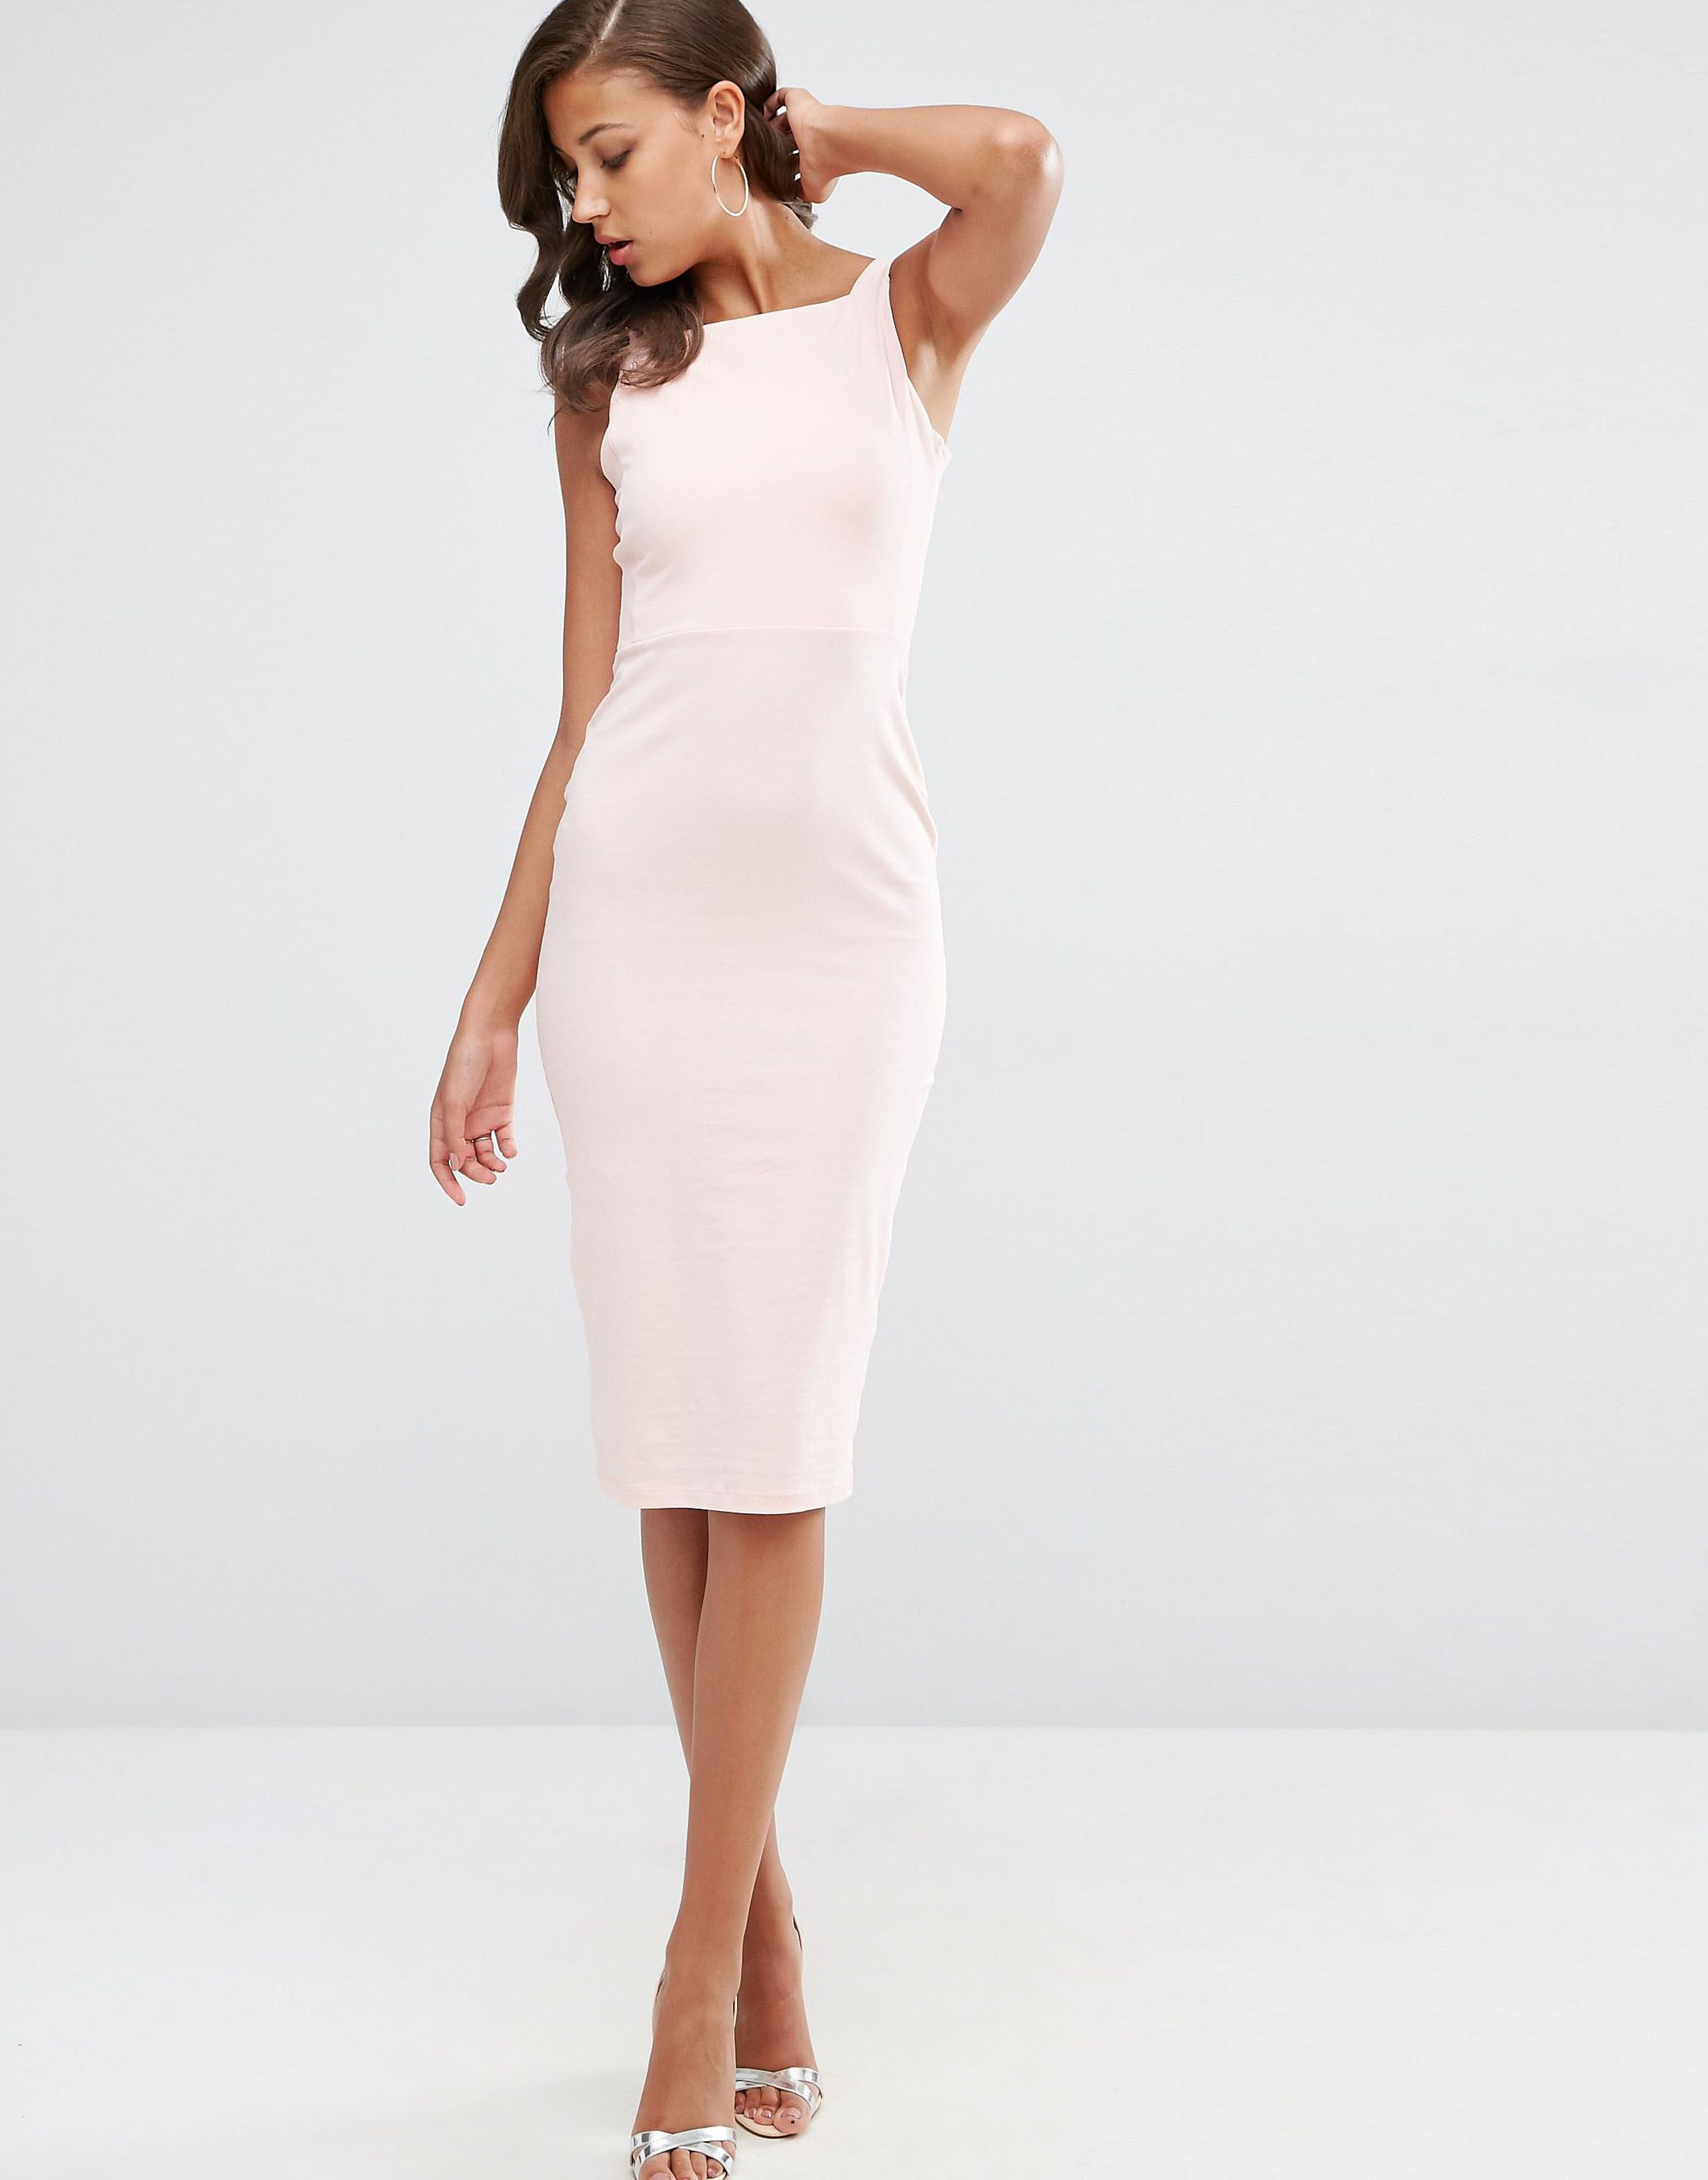 37318a40f730 us.asos.com ---- asos-tall-strap-back-pini-bodycon-midi-dress-nude ...